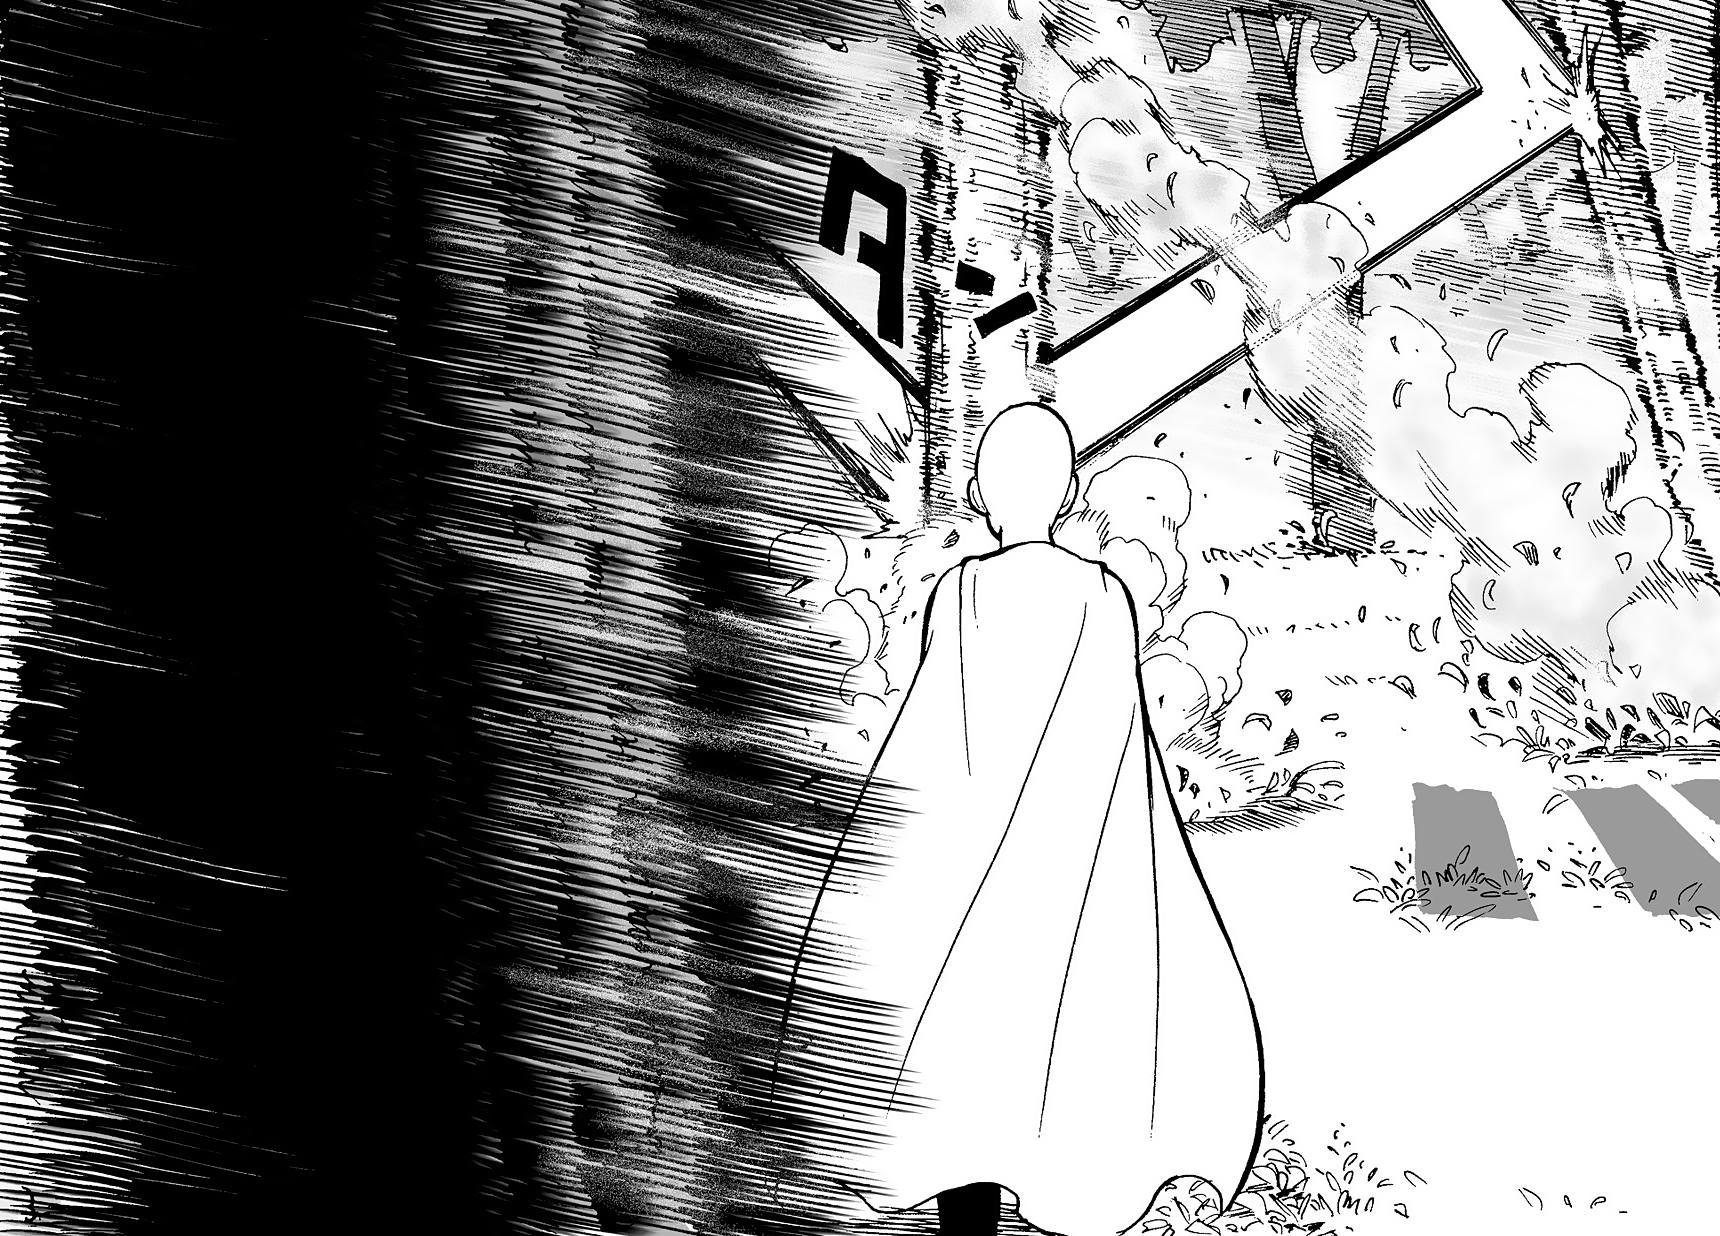 http://c5.ninemanga.com/es_manga/21/14805/362283/94d231f11cdc1fae024849f33f7a7156.jpg Page 7